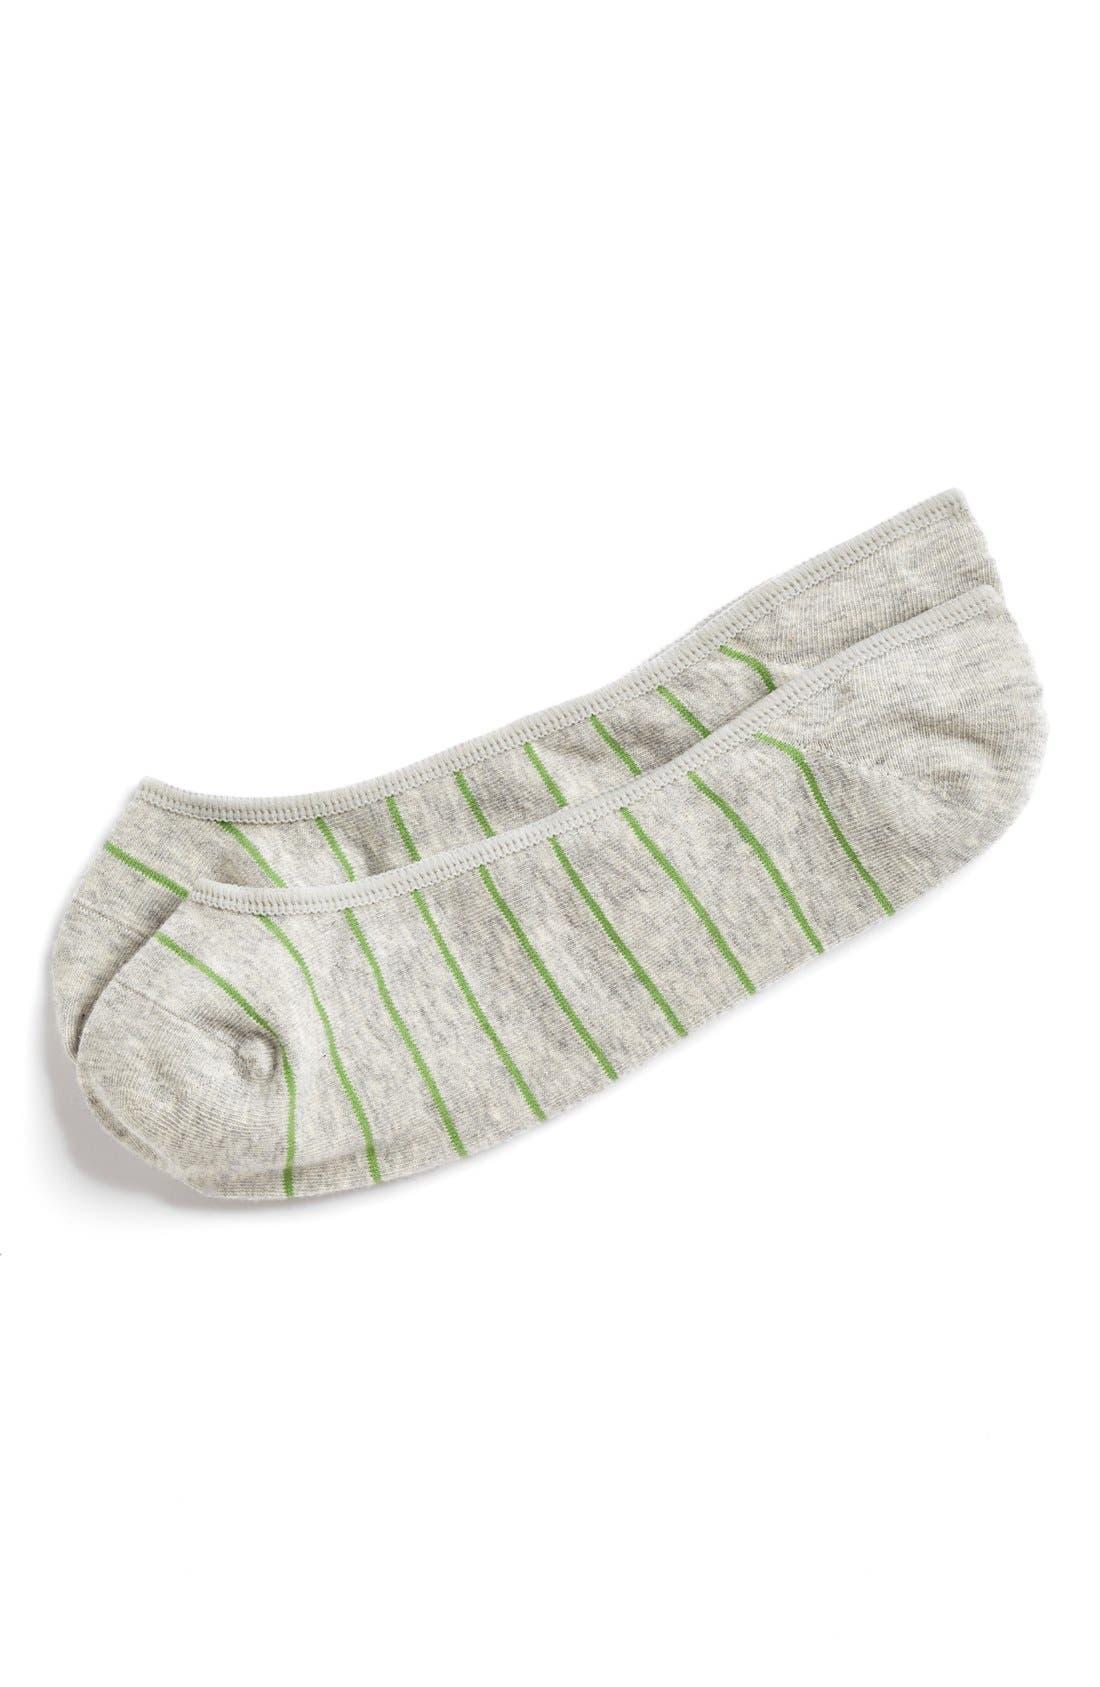 Alternate Image 1 Selected - 1901 No-Show Liner Socks